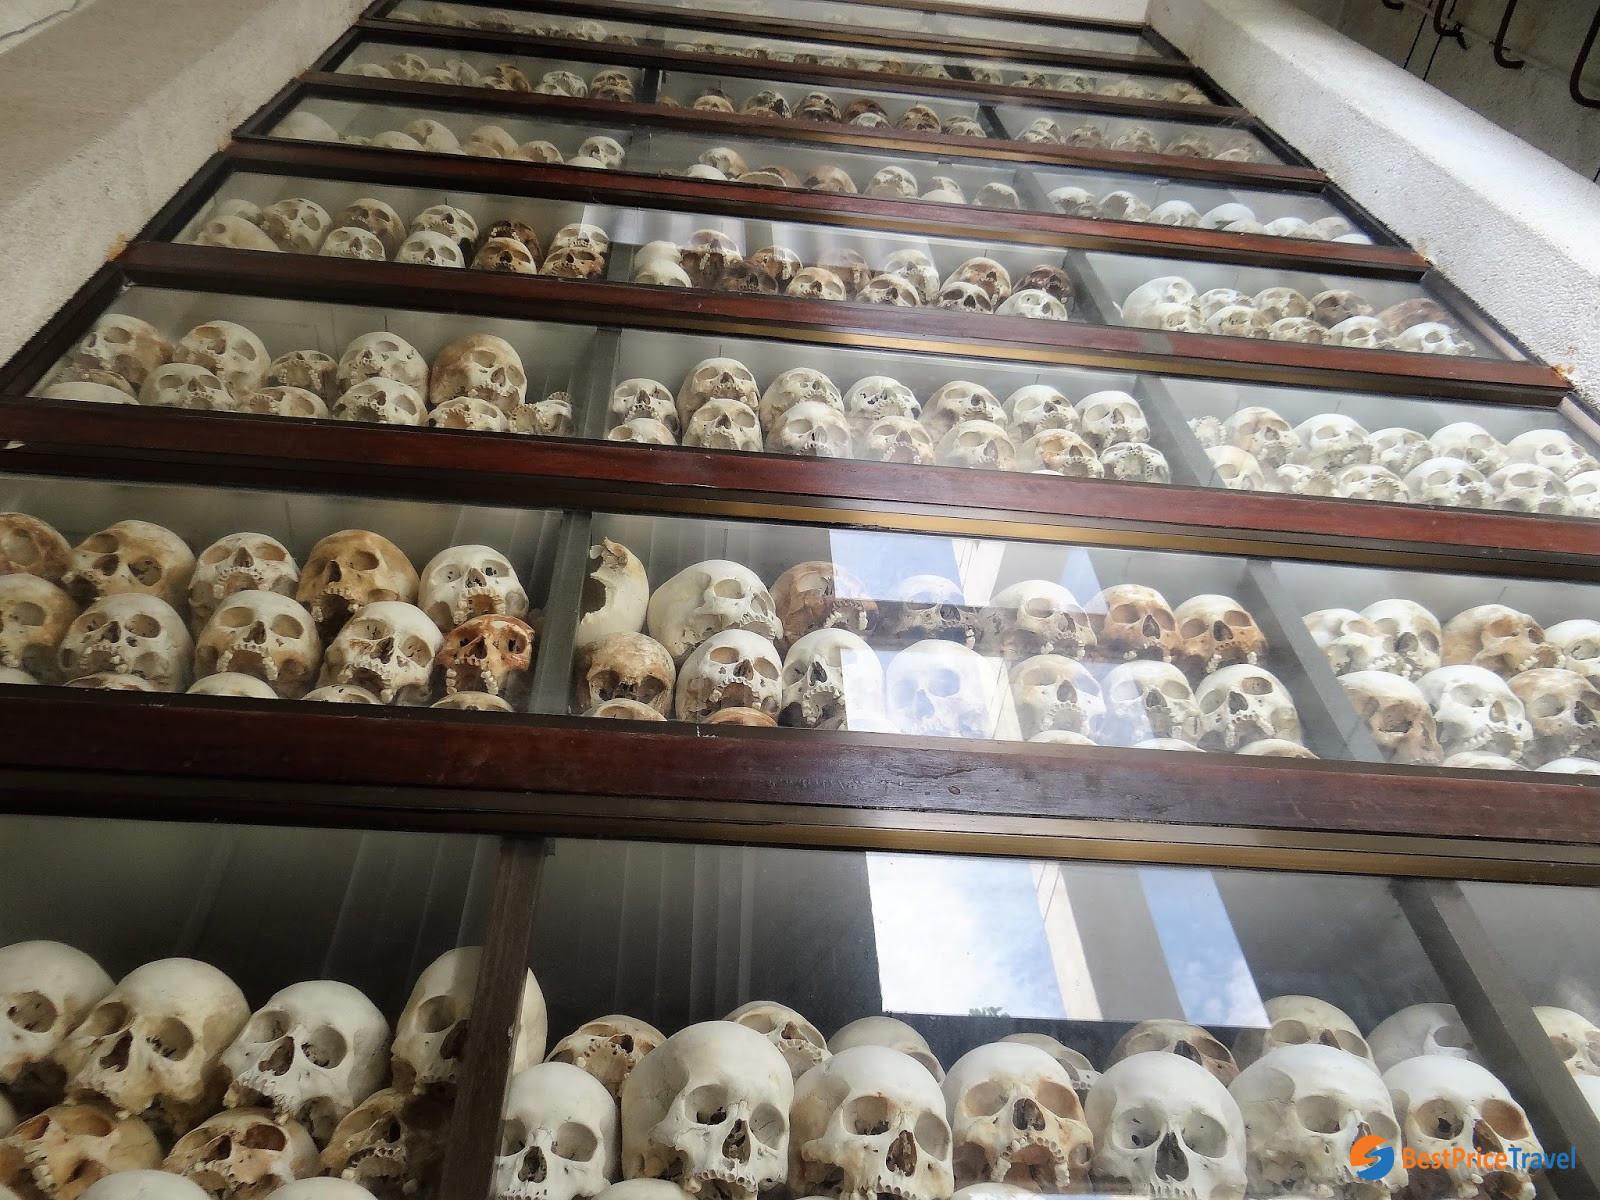 Cambodian skulls in Choeung Ek